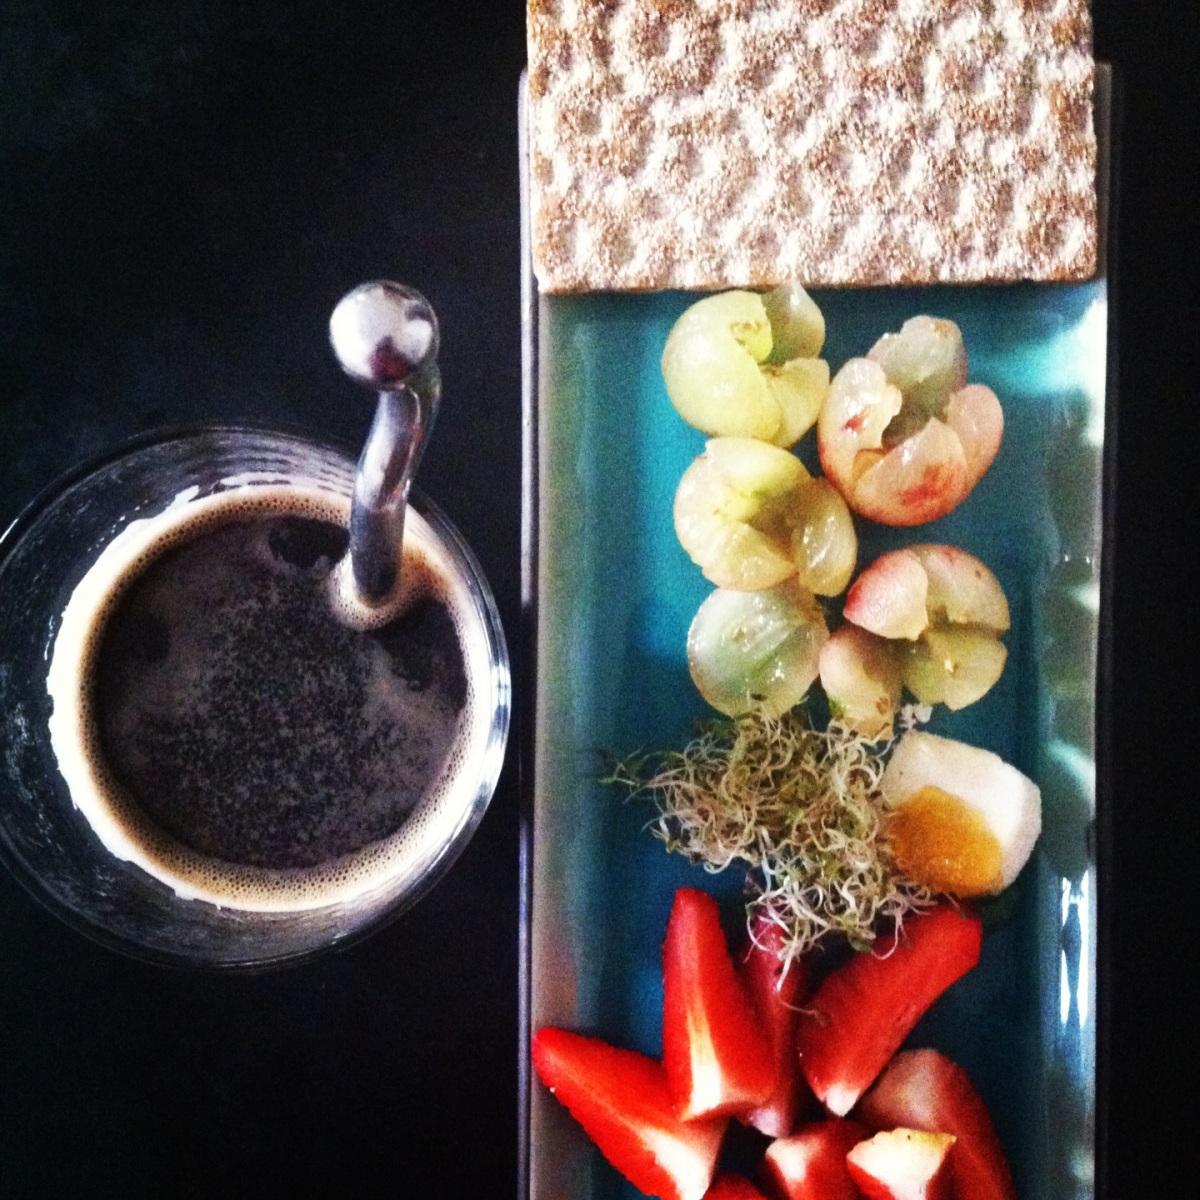 Manger bio ou finir à Grévin? #DirtyDozen